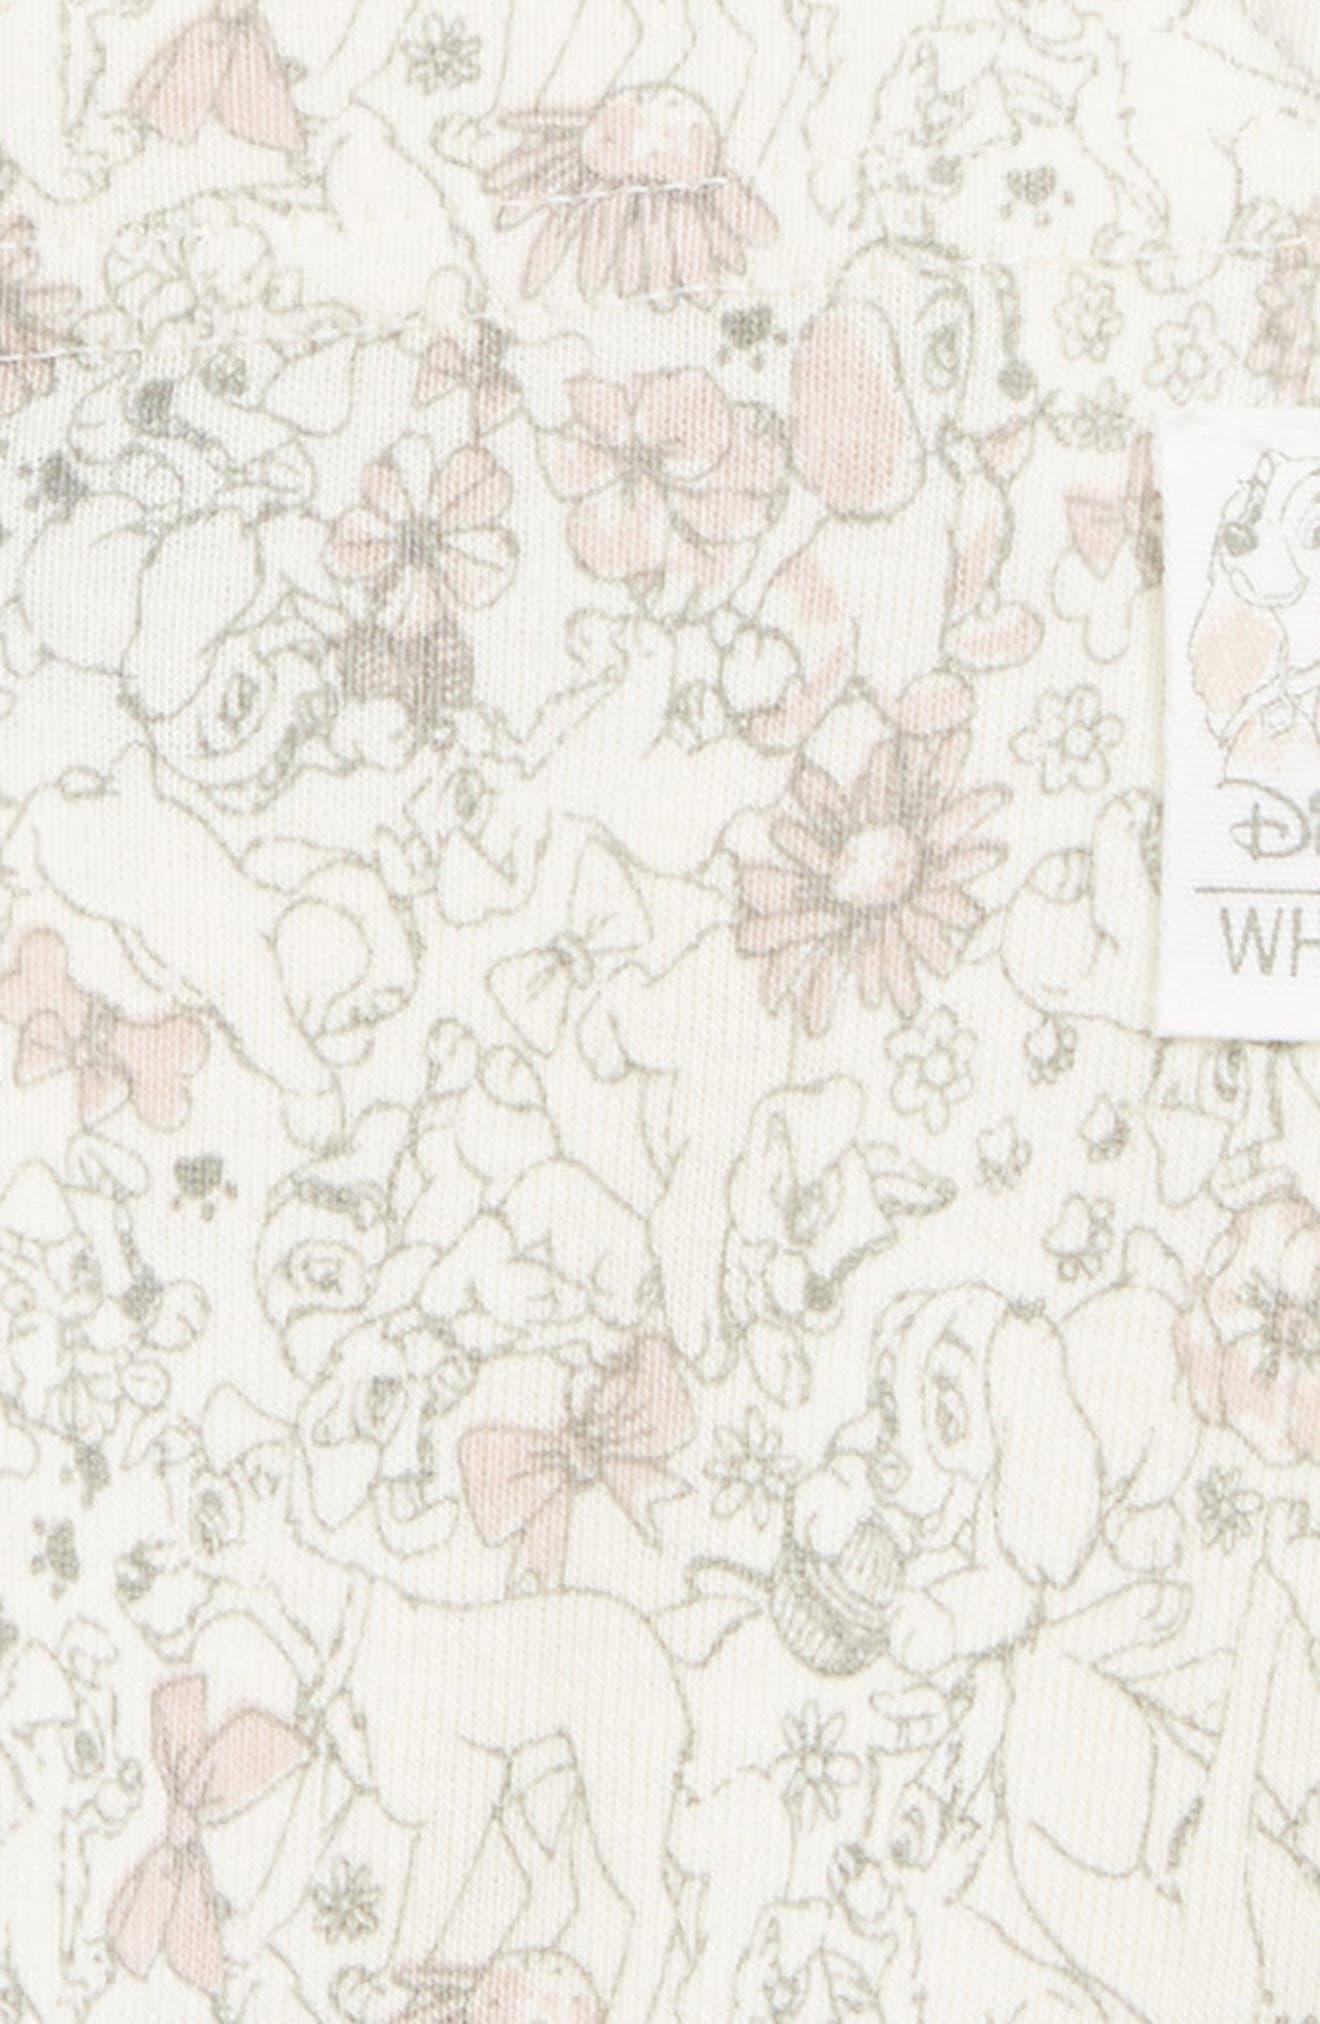 Disney 'Lady & the Tramp' Organic Cotton Leggings,                             Alternate thumbnail 2, color,                             900